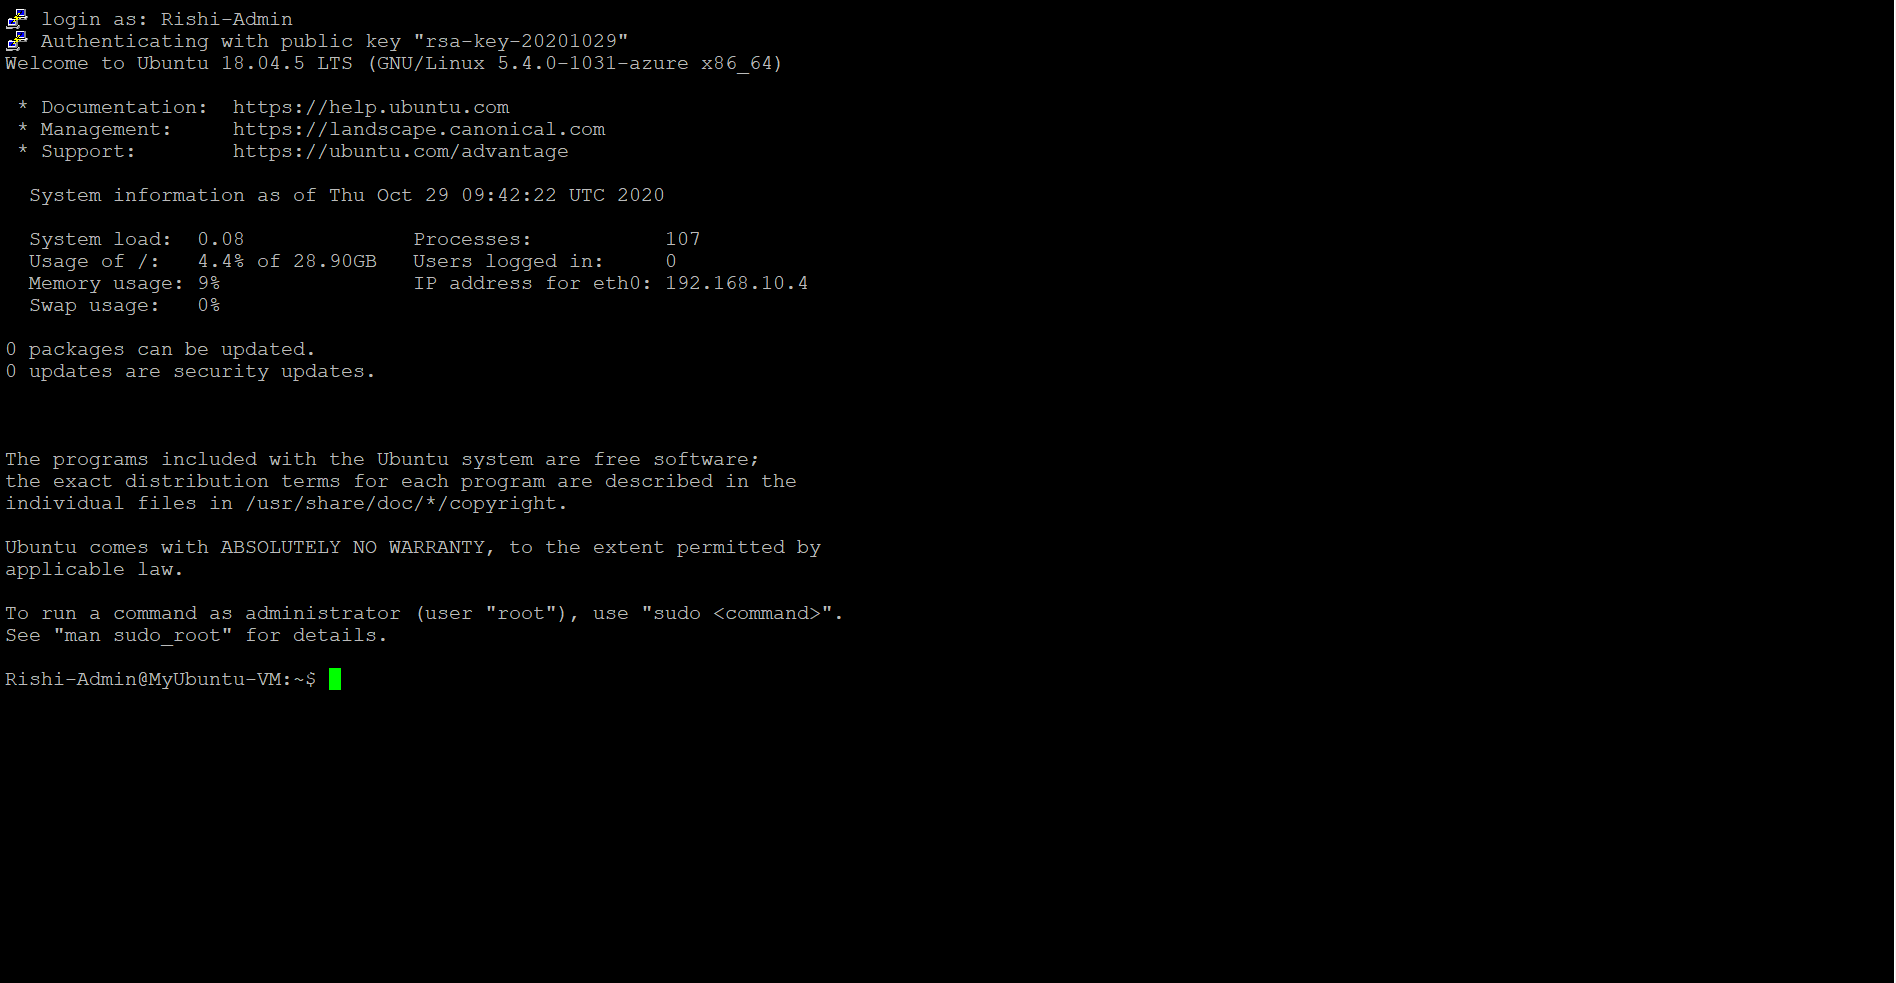 Virtual machine authentication successful.